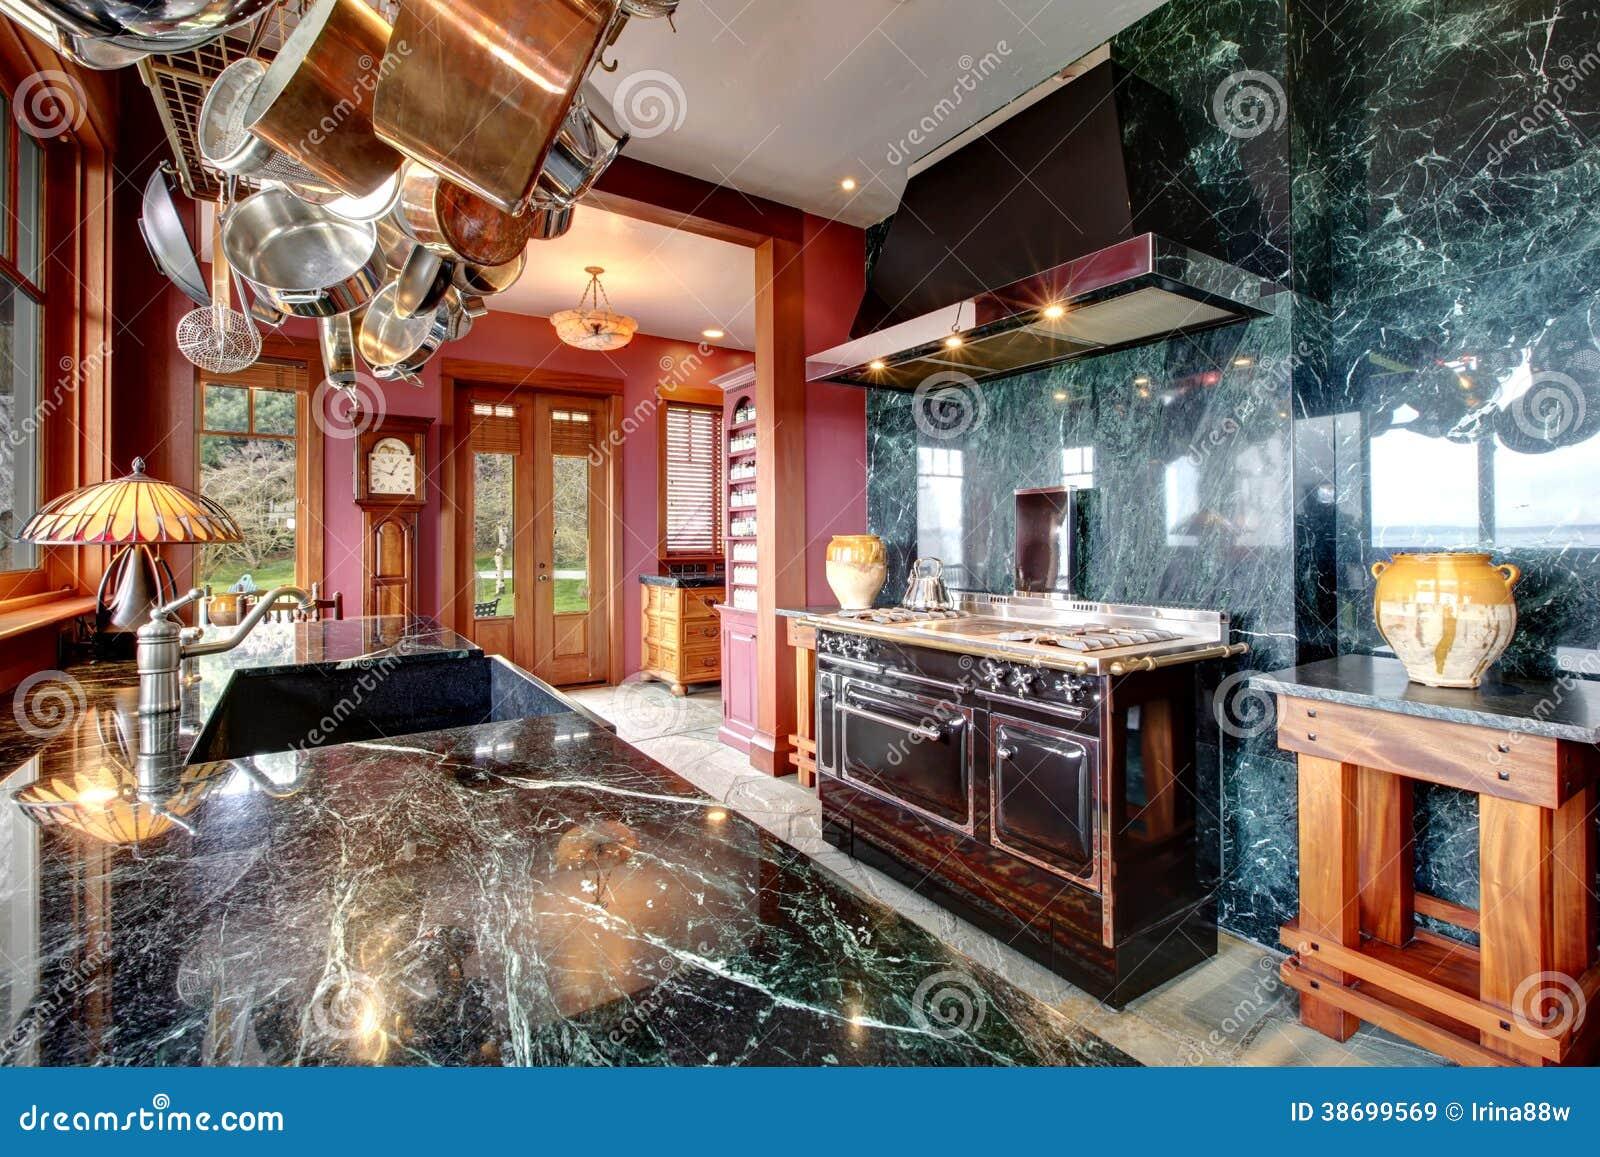 Luxury Marble Kitchen Room Stock Image Image Of Furnished